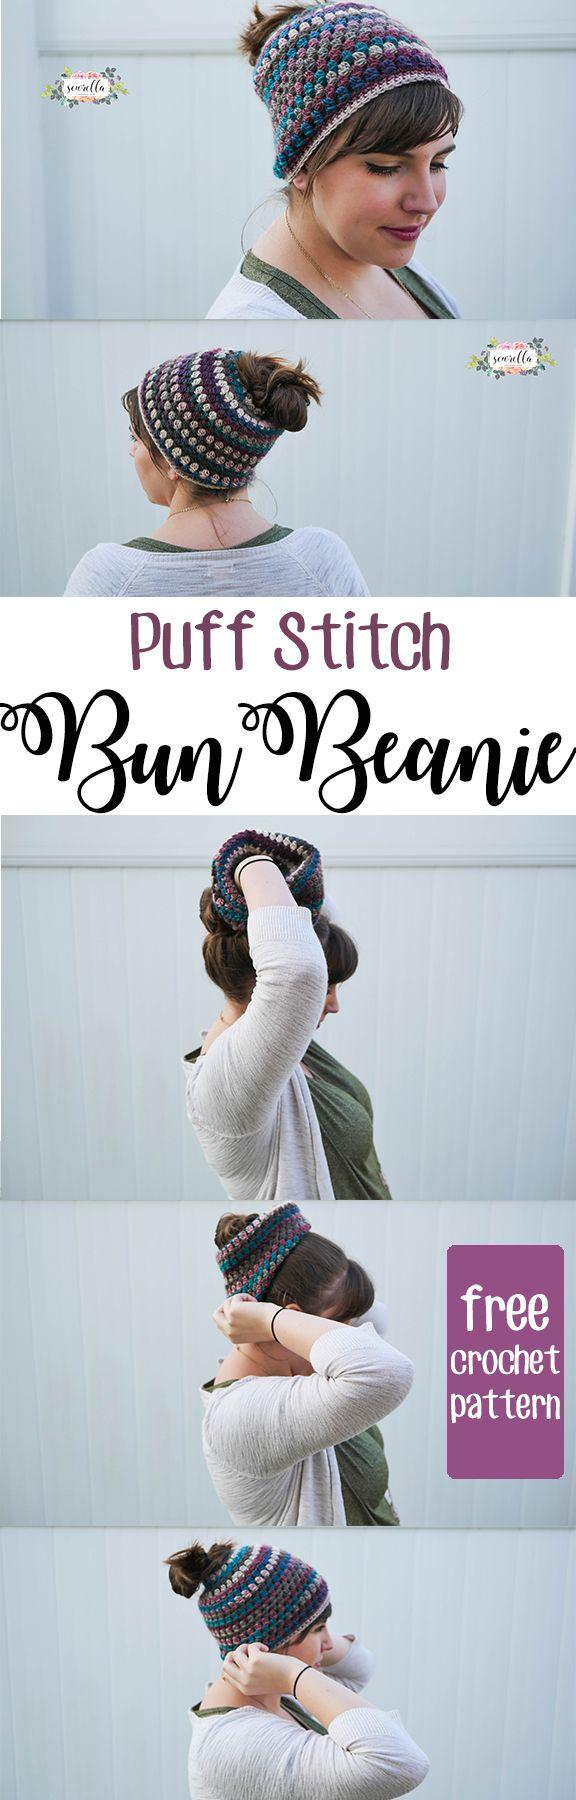 Crochet Puff Stitch Bun Beanie | Colas de caballo, Gorros y Caballos